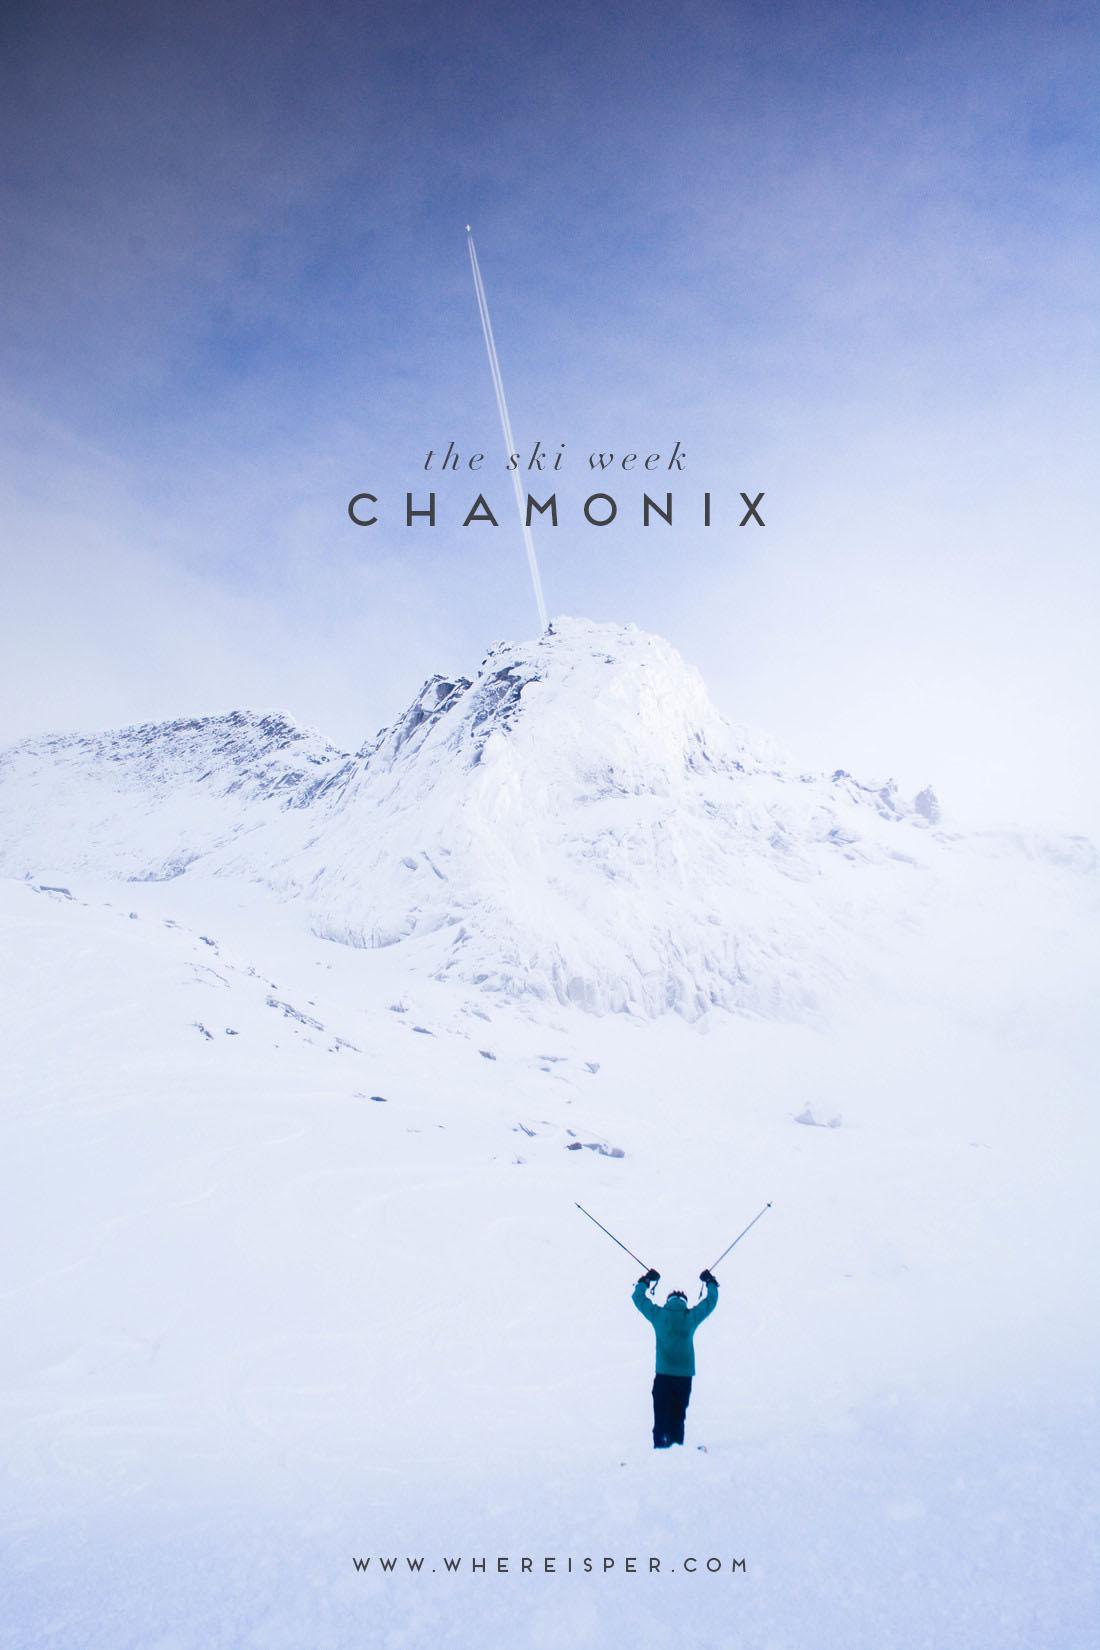 The Ski Week Chamonix